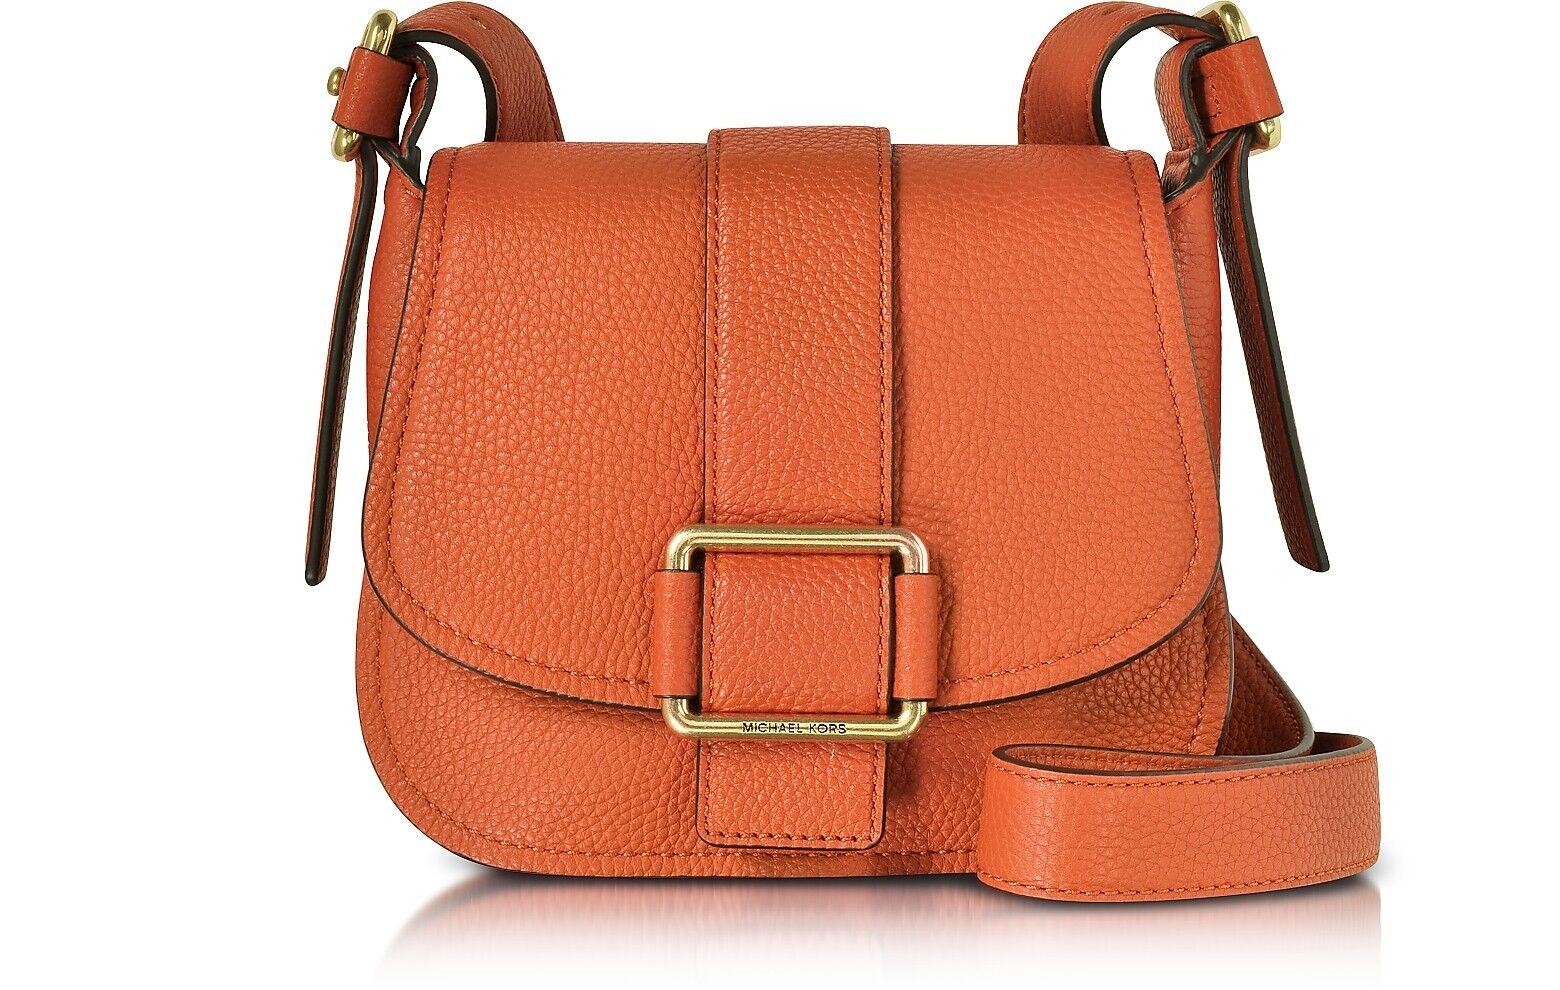 NWT MICHAEL KORS MAXINE Medium Leather SADDLE BAG Orange - $